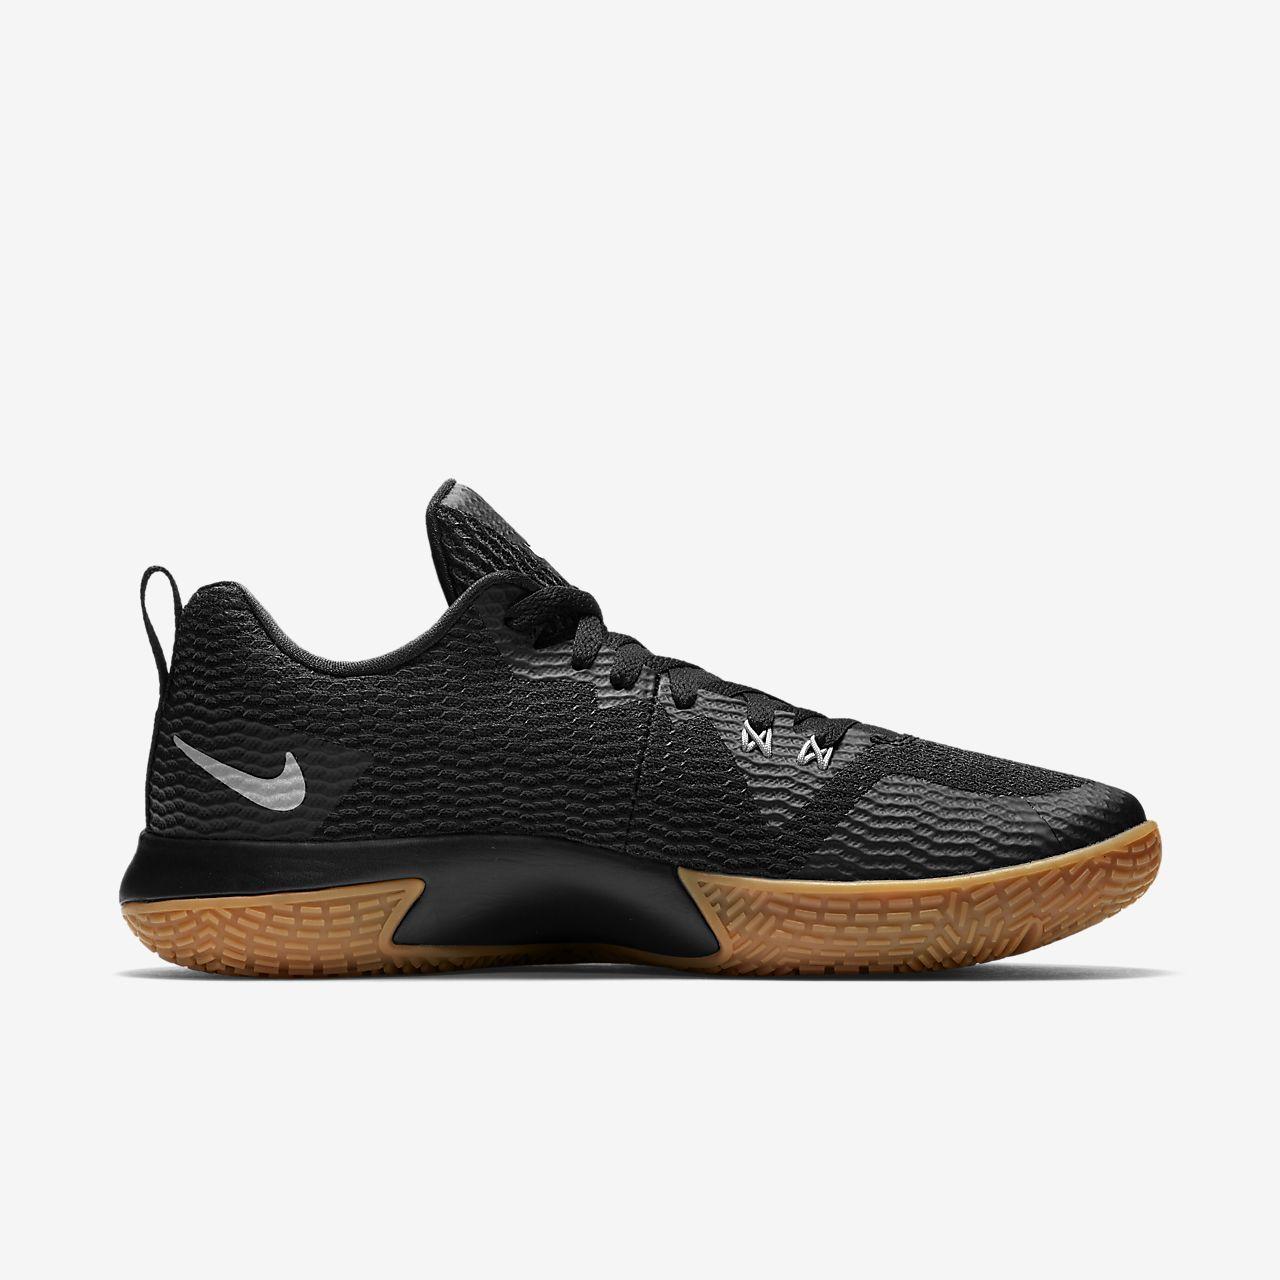 Mens Zoom Live Ii Basketball Shoes Nike LnQQs3hi